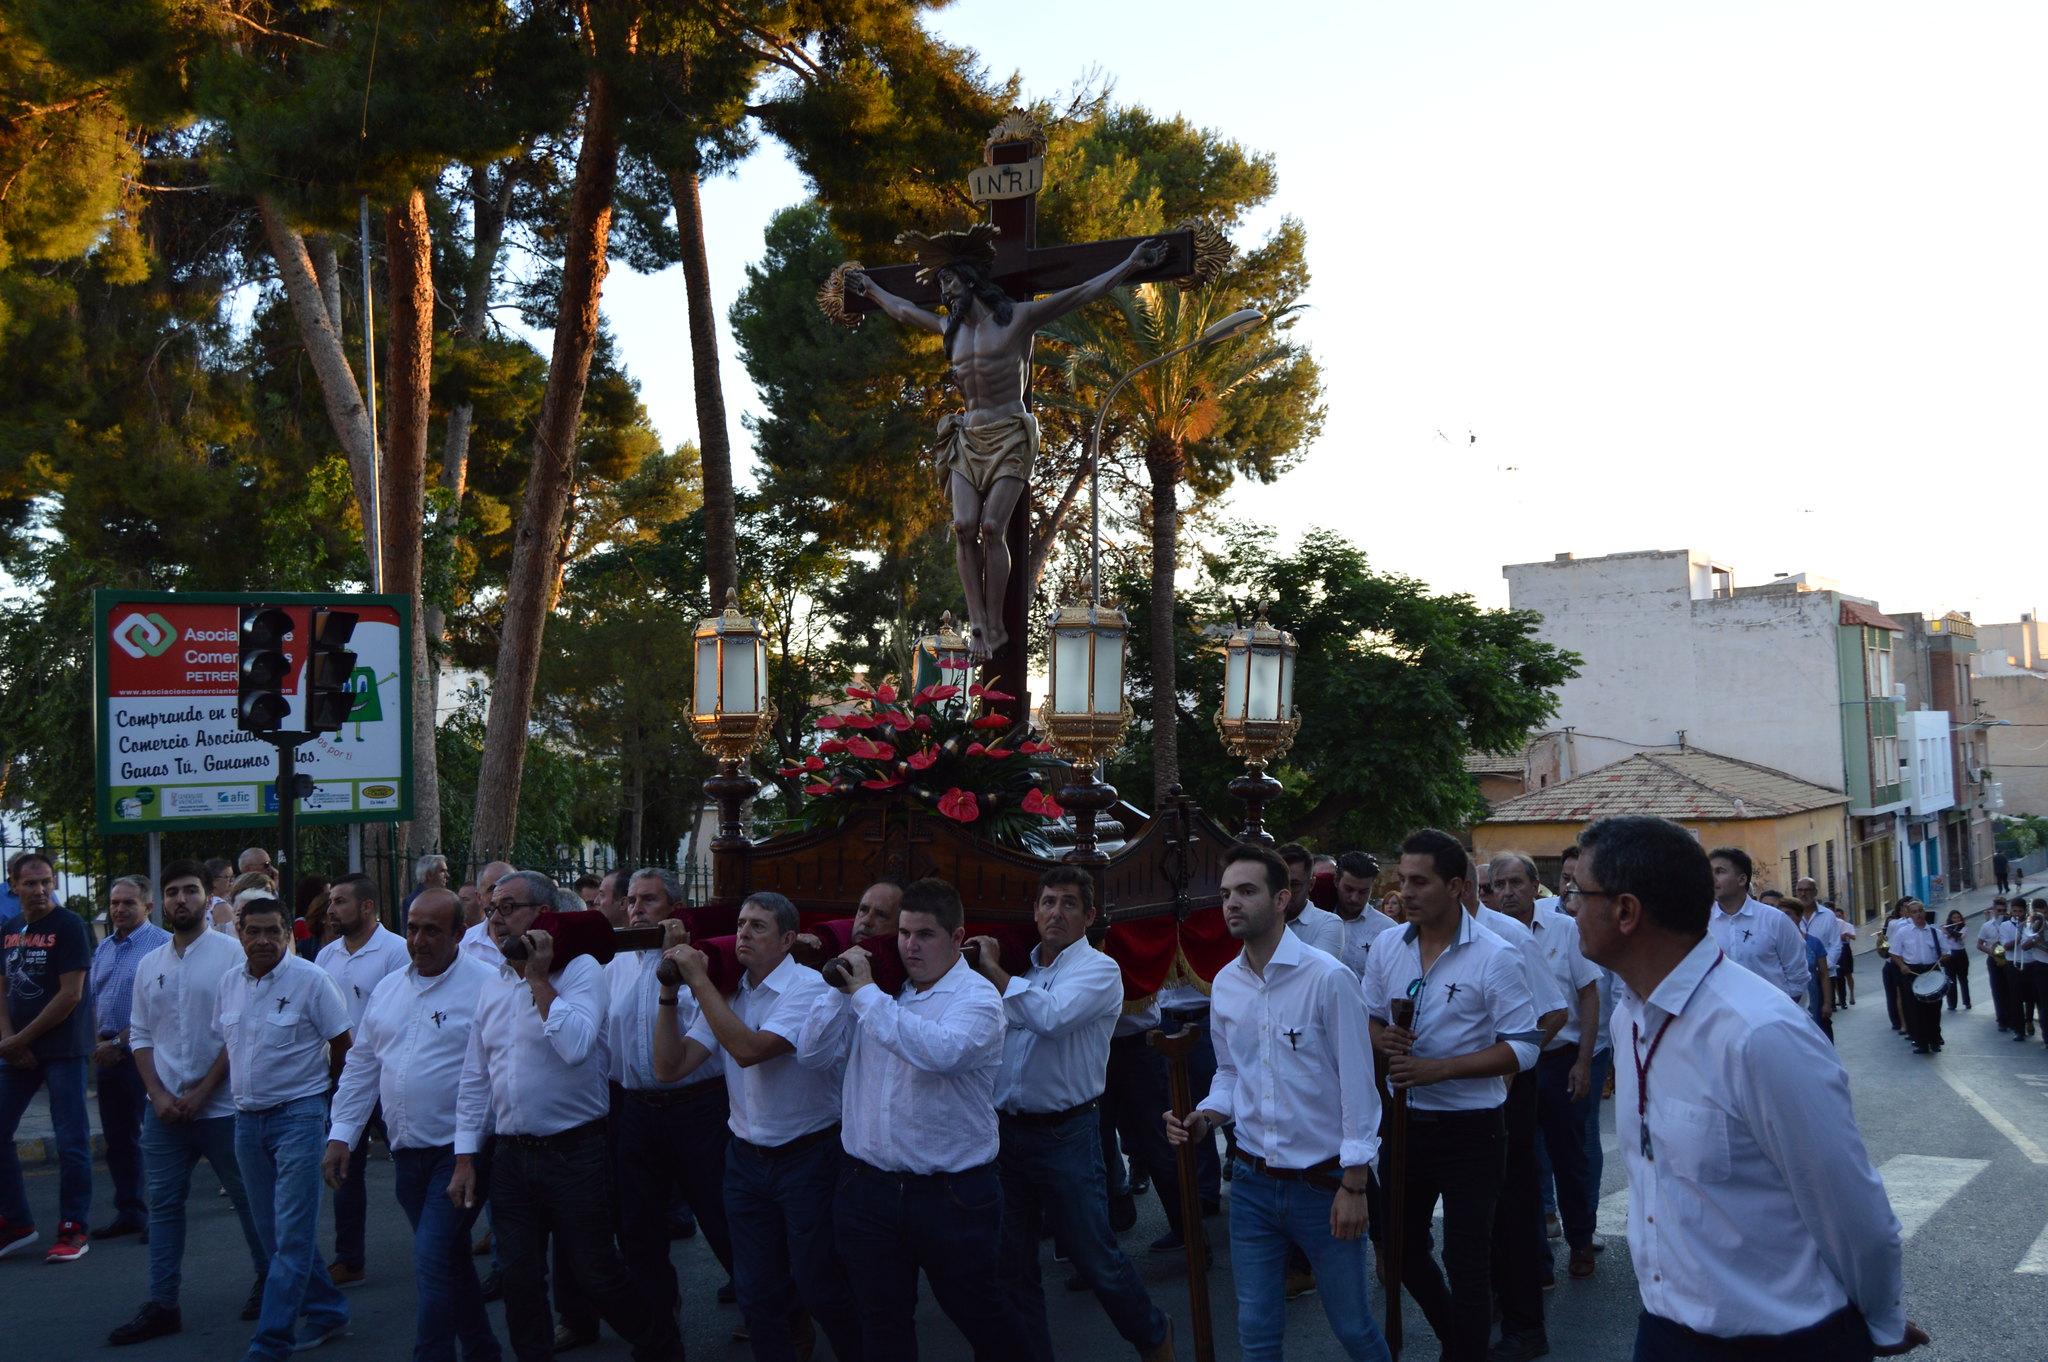 (2017-07-02) Procesión de subida (Adrián Romero Montesinos) (65)